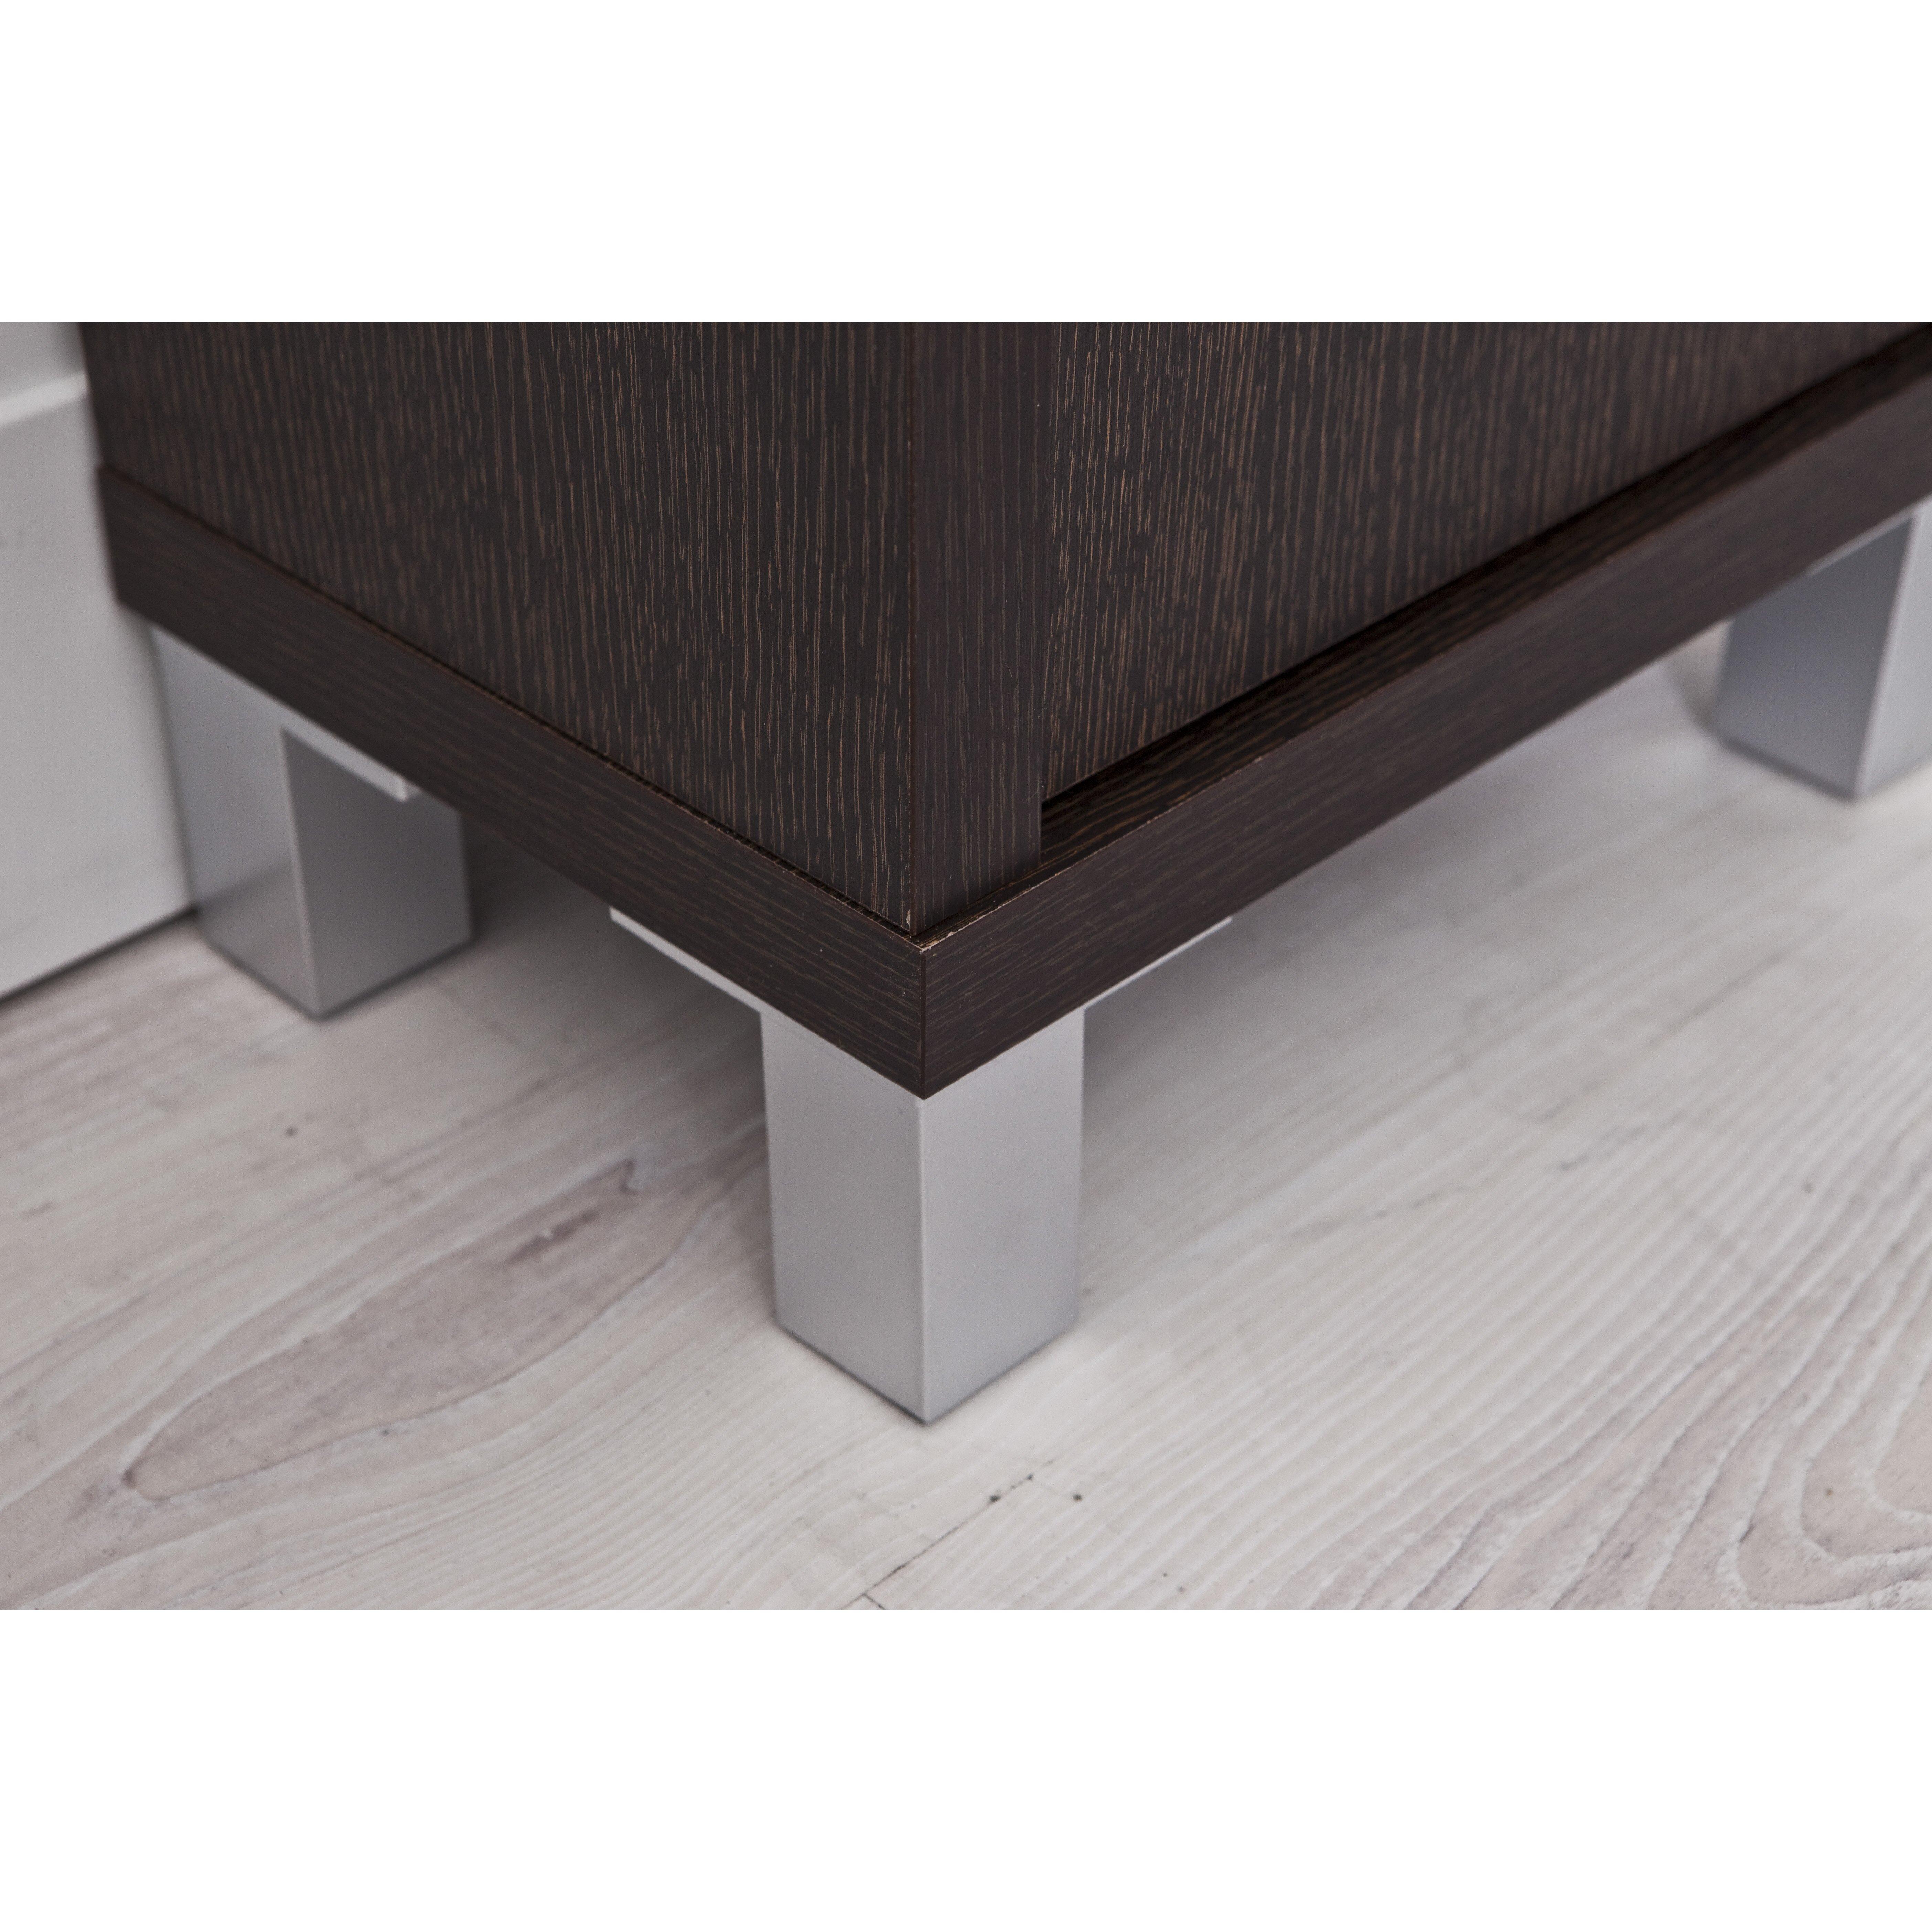 Hokku Designs Galveston 34 x 141cm Freestanding Cabinet